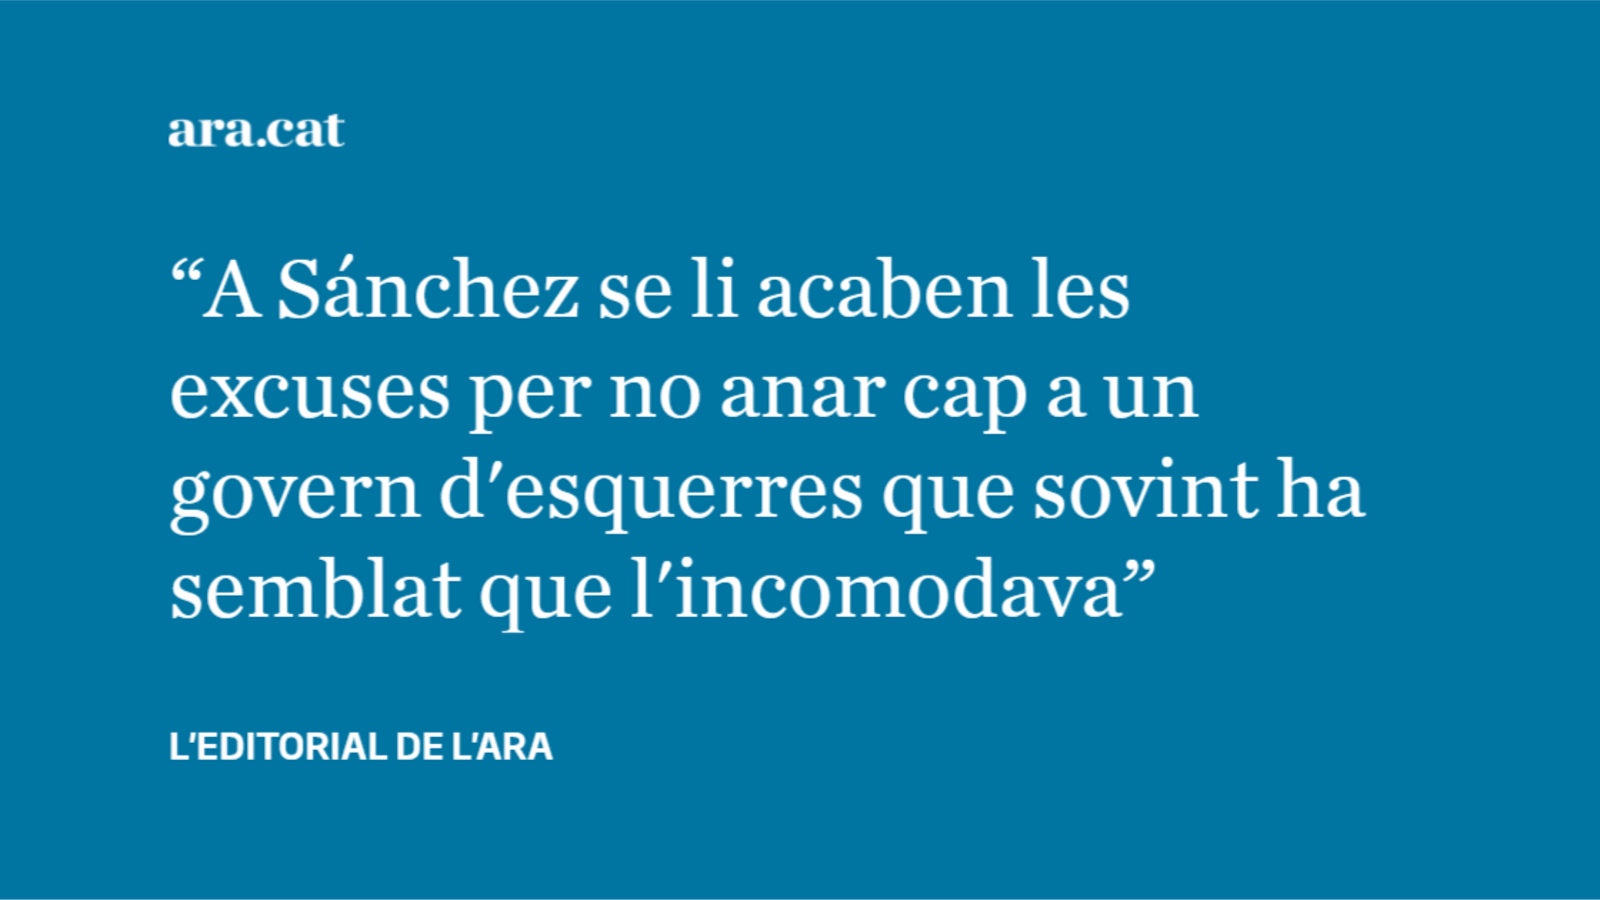 Sánchez ja no té excusa